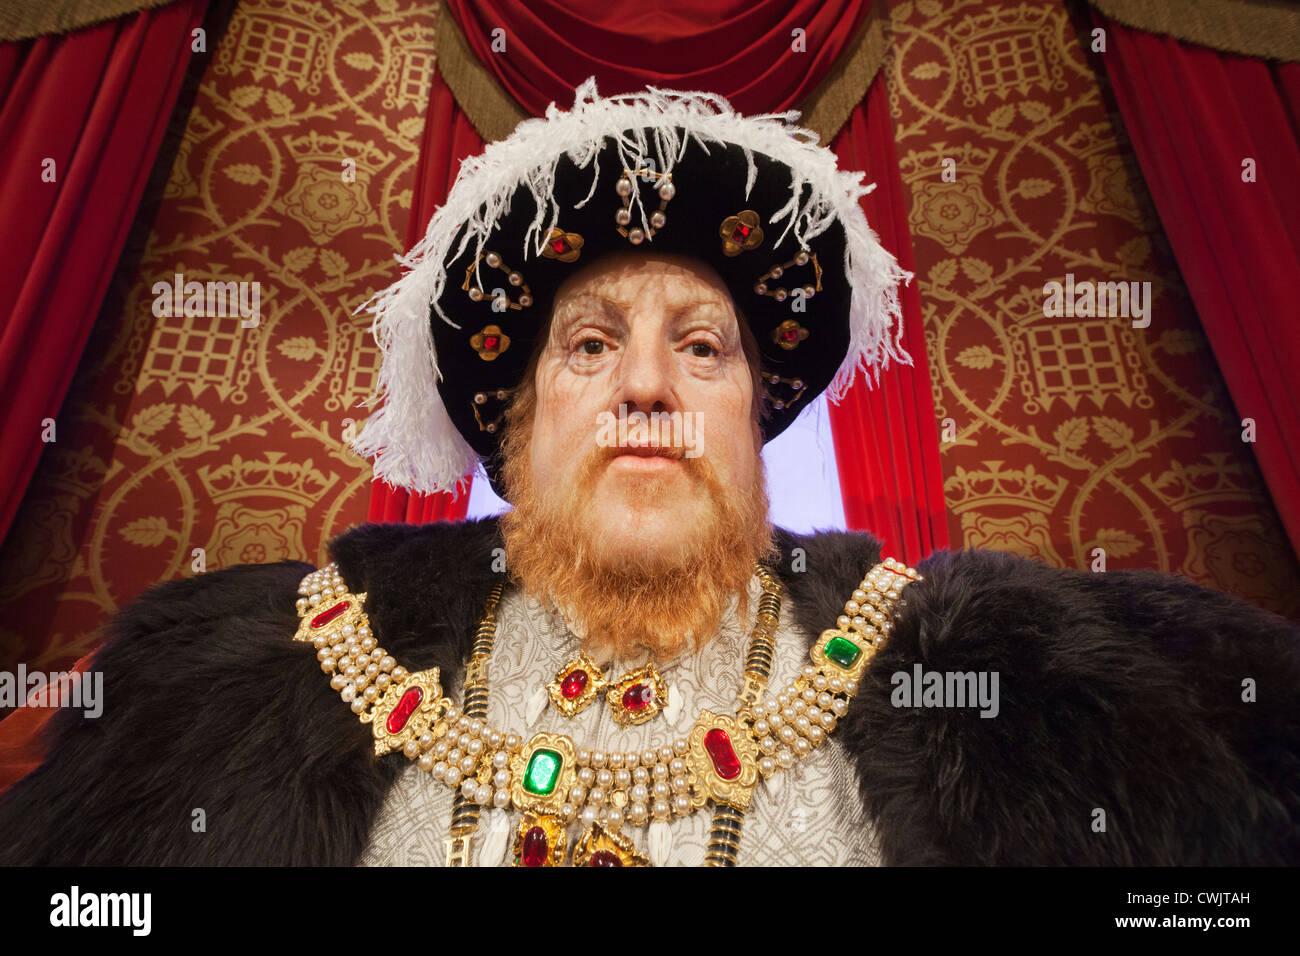 England,London,Madame Tussauds,Waxwork Display of Henry VIII  - Stock Image